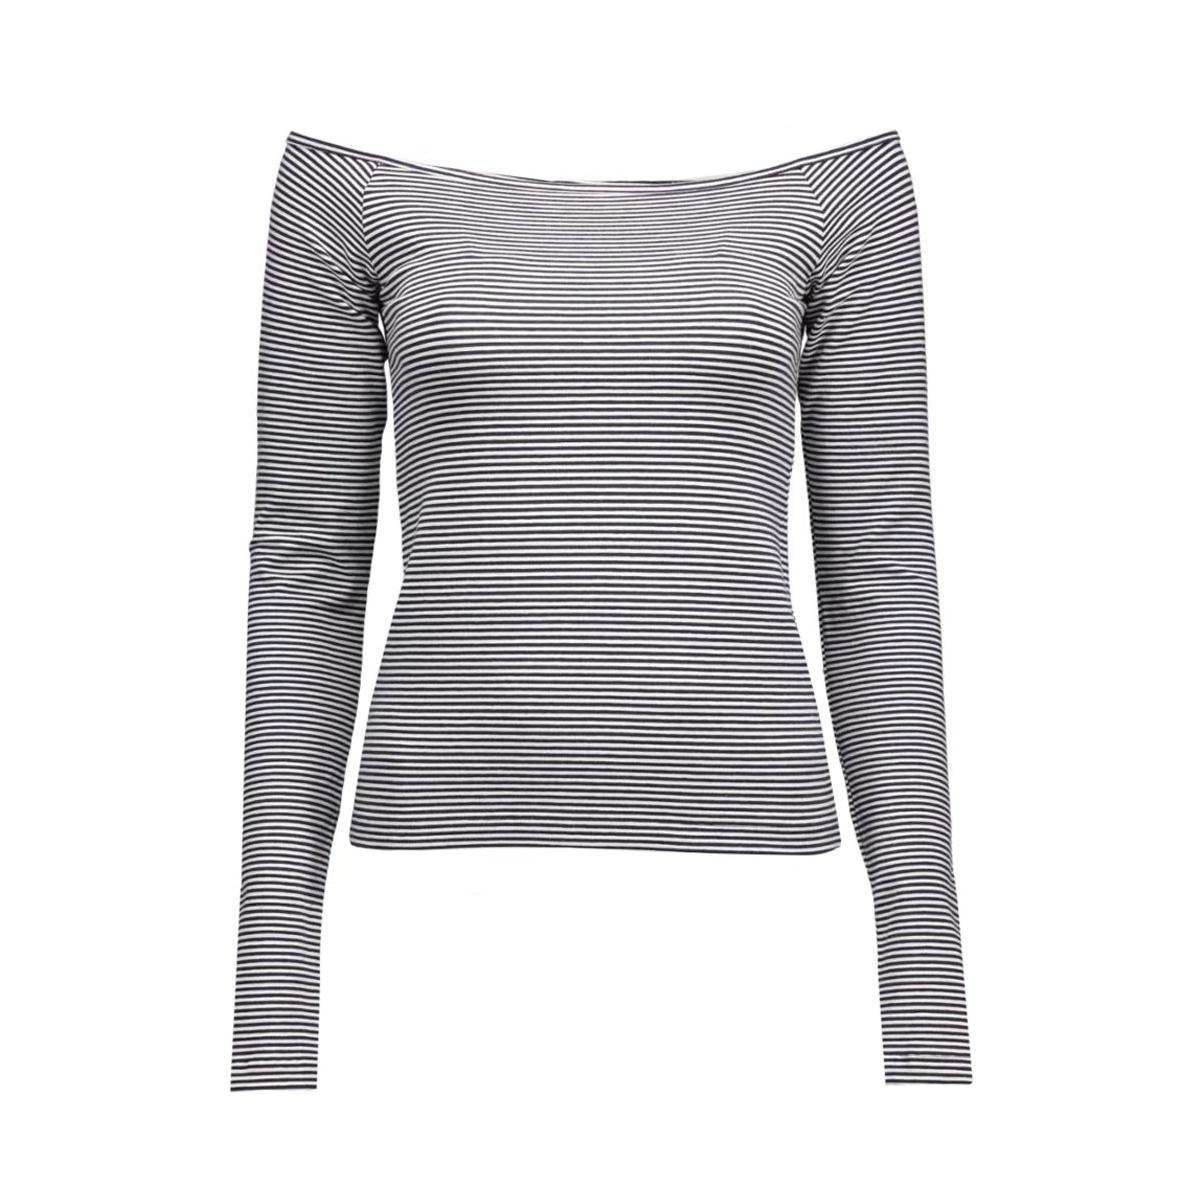 pctilly off shoulder top 17073502 pieces t-shirt navy blazer